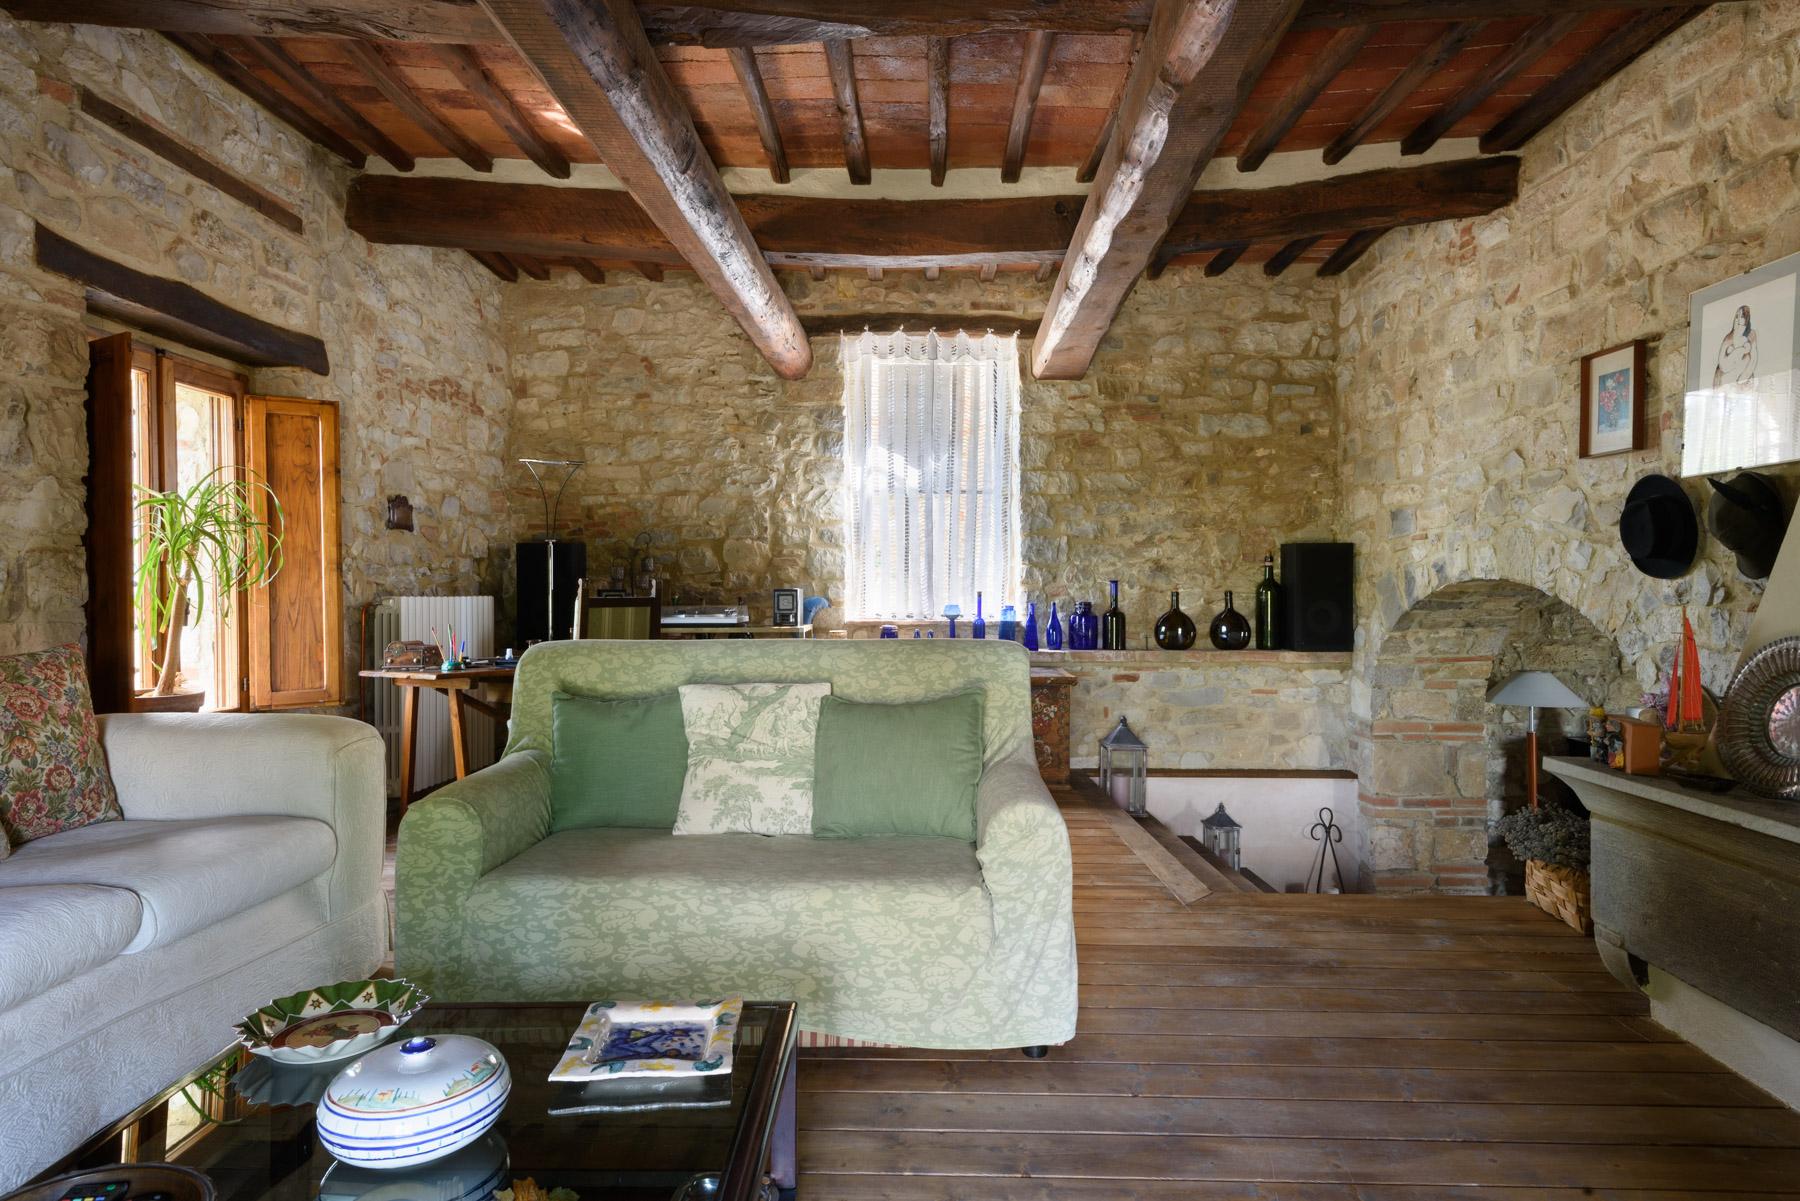 Rustico in Vendita a Castellina In Chianti: 5 locali, 650 mq - Foto 13